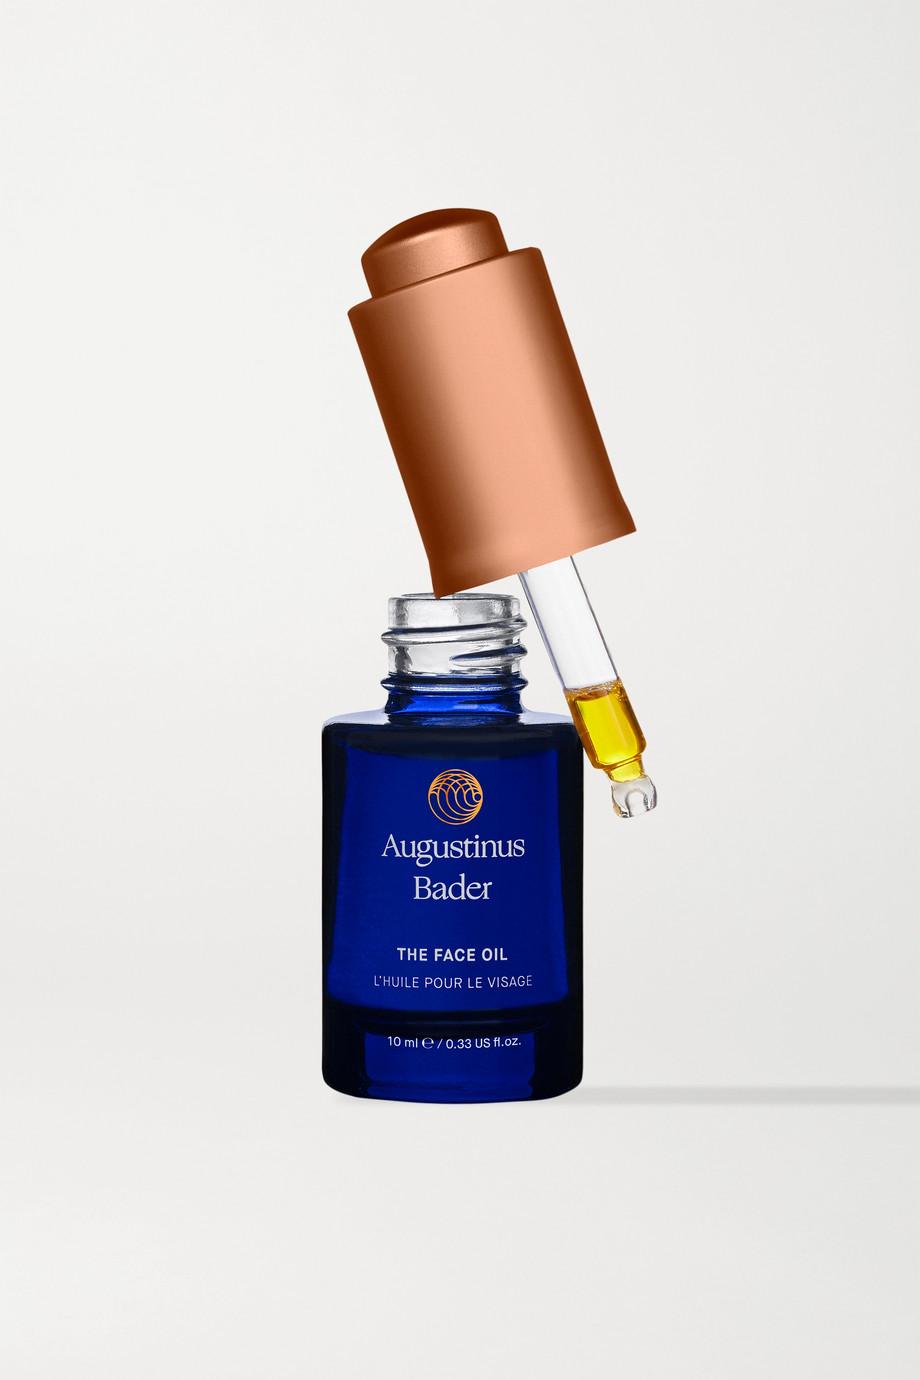 Augustinus Bader The Face Oil, 10 ml – Gesichtsöl